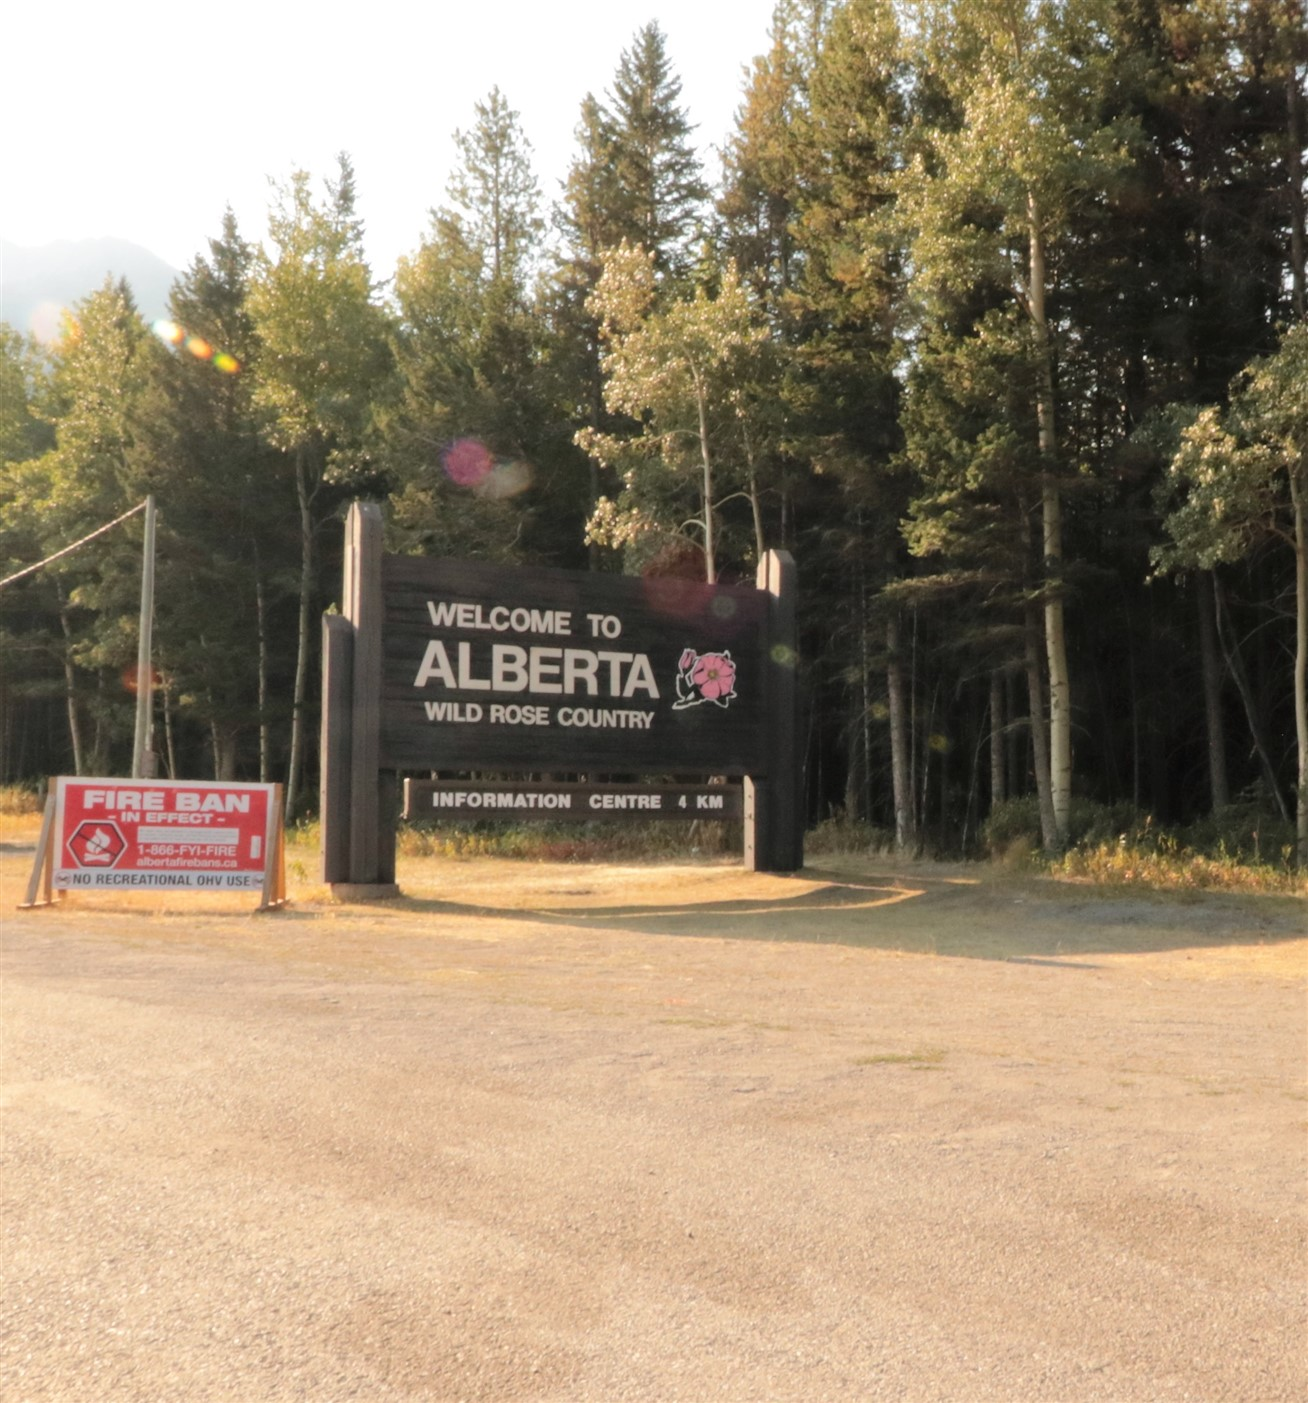 2017 09 03 20 Southwest Alberta